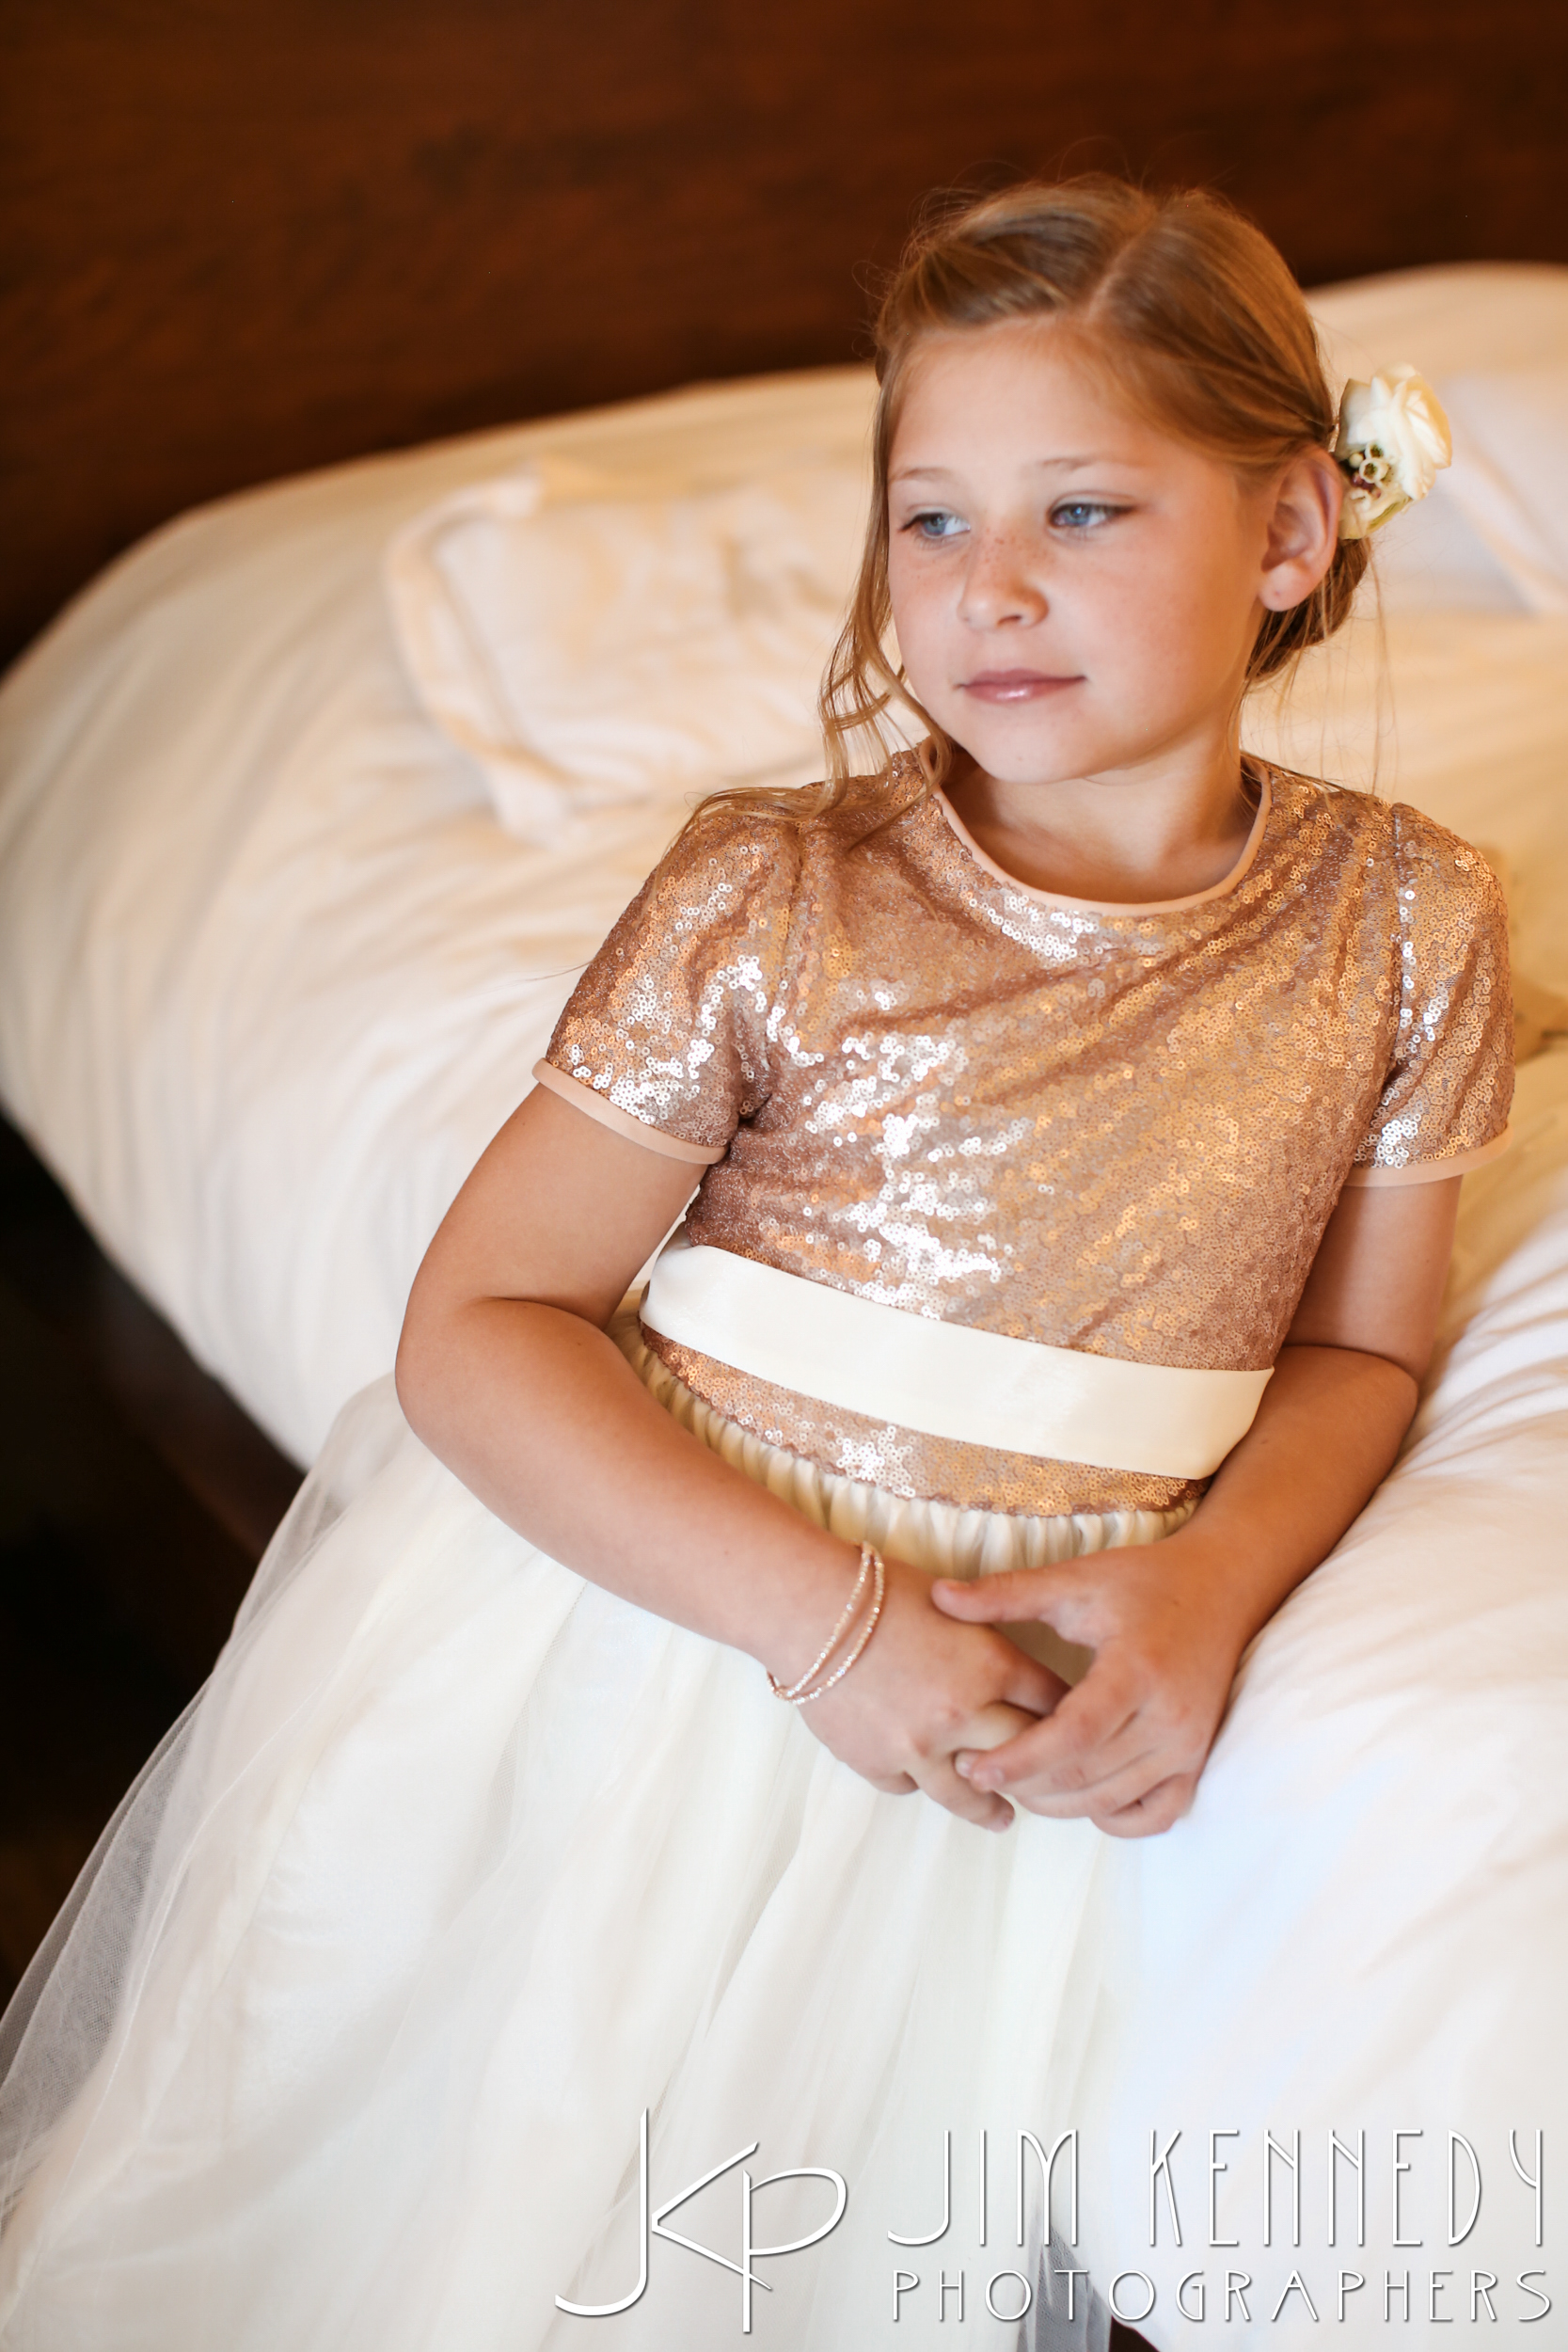 jim_kennedy_photographers_highland_springs_wedding_caitlyn_0042.jpg